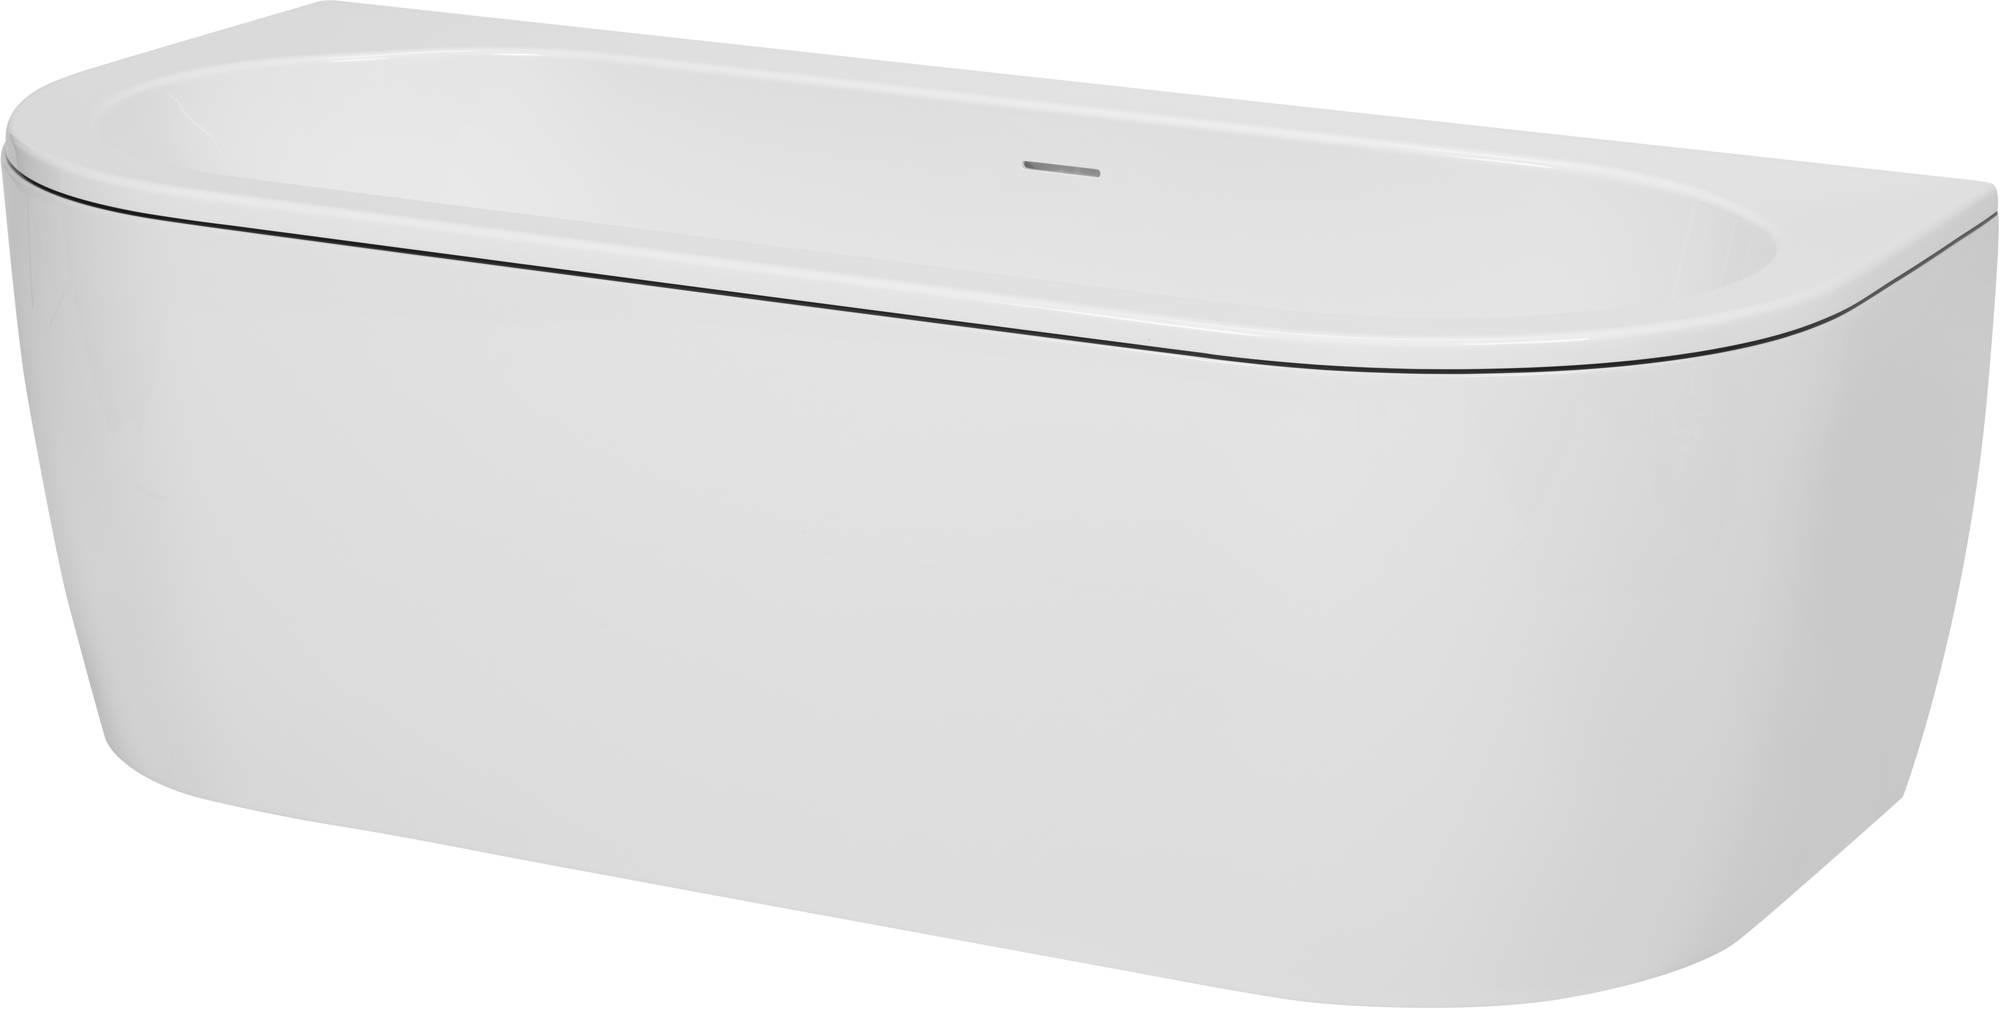 Saniselect Hilla Bad Back-to-Wall met zwarte rand en witte waste cover 180x81,5x44 cm Wit